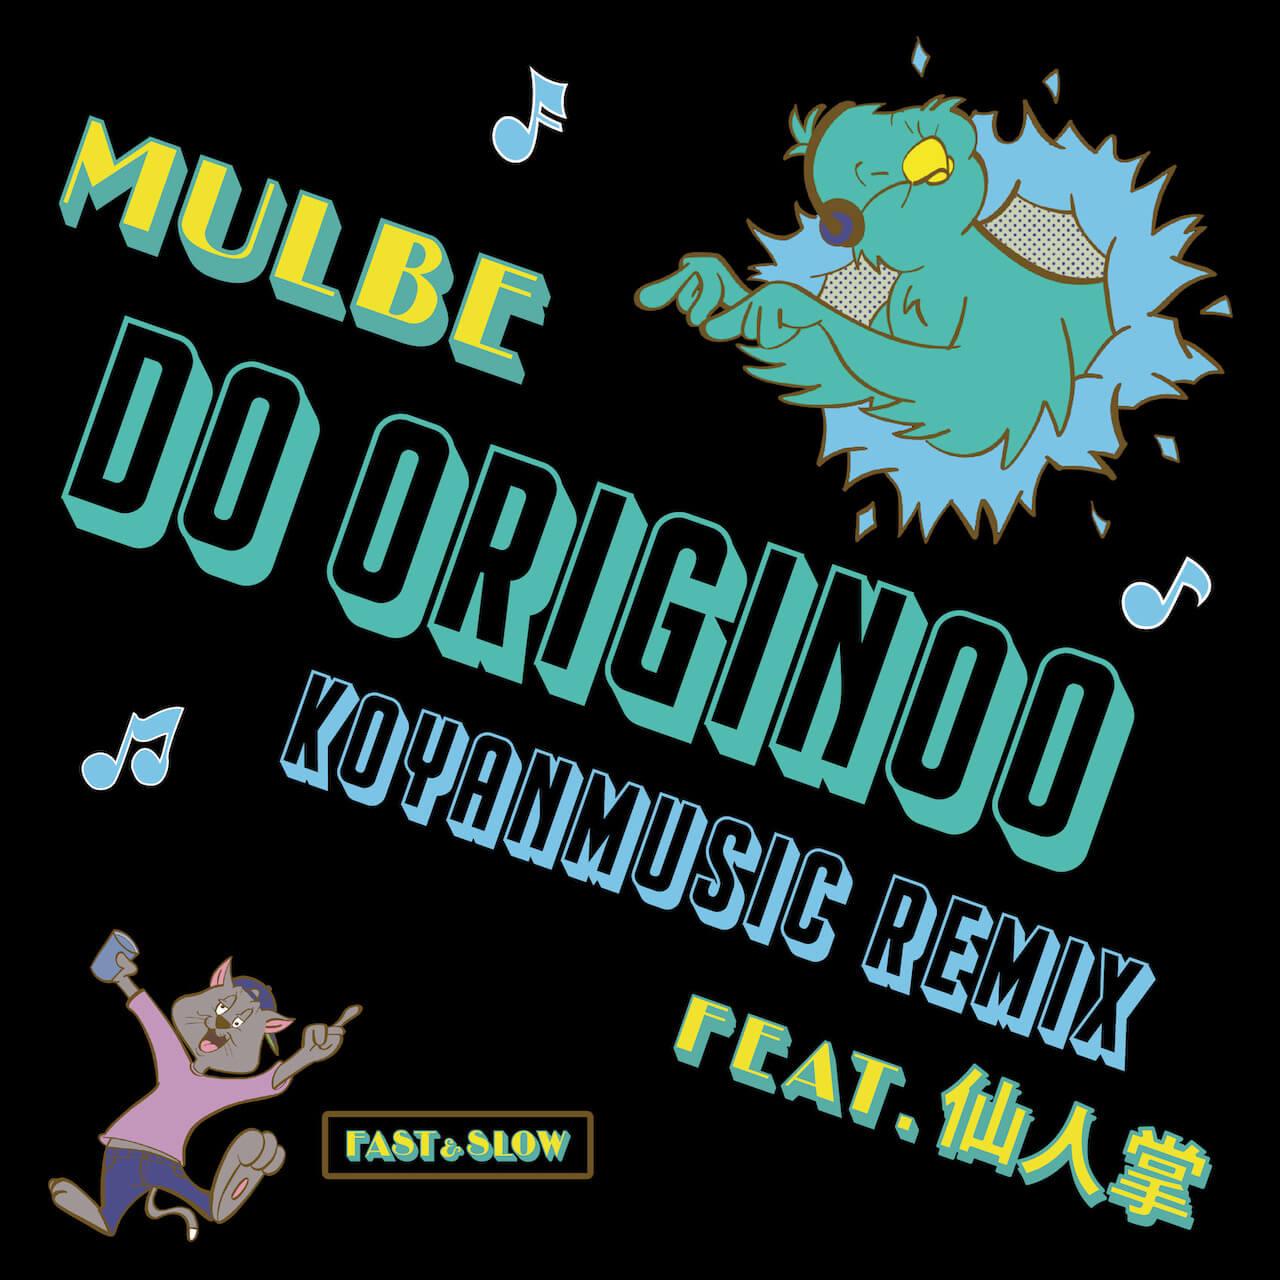 MULBEと仙人掌のコラボ曲「DO ORIGINOO」をKOYANMUSICがリミックス msuci210409-mulbe-1